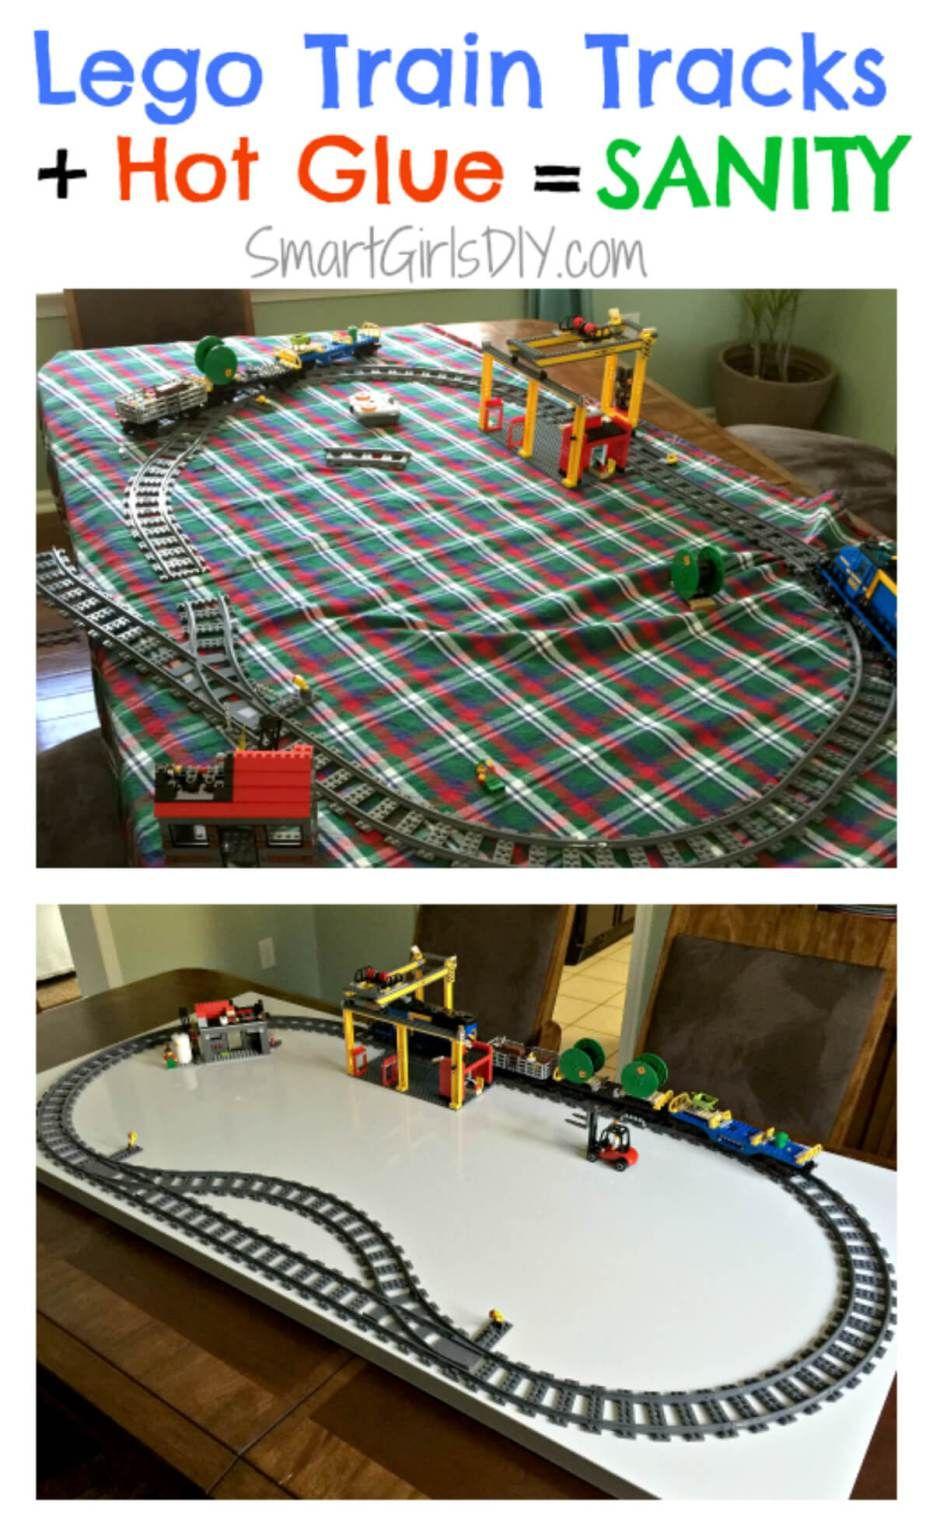 Lego Train Tracks plus Hot Glue equals Sanity